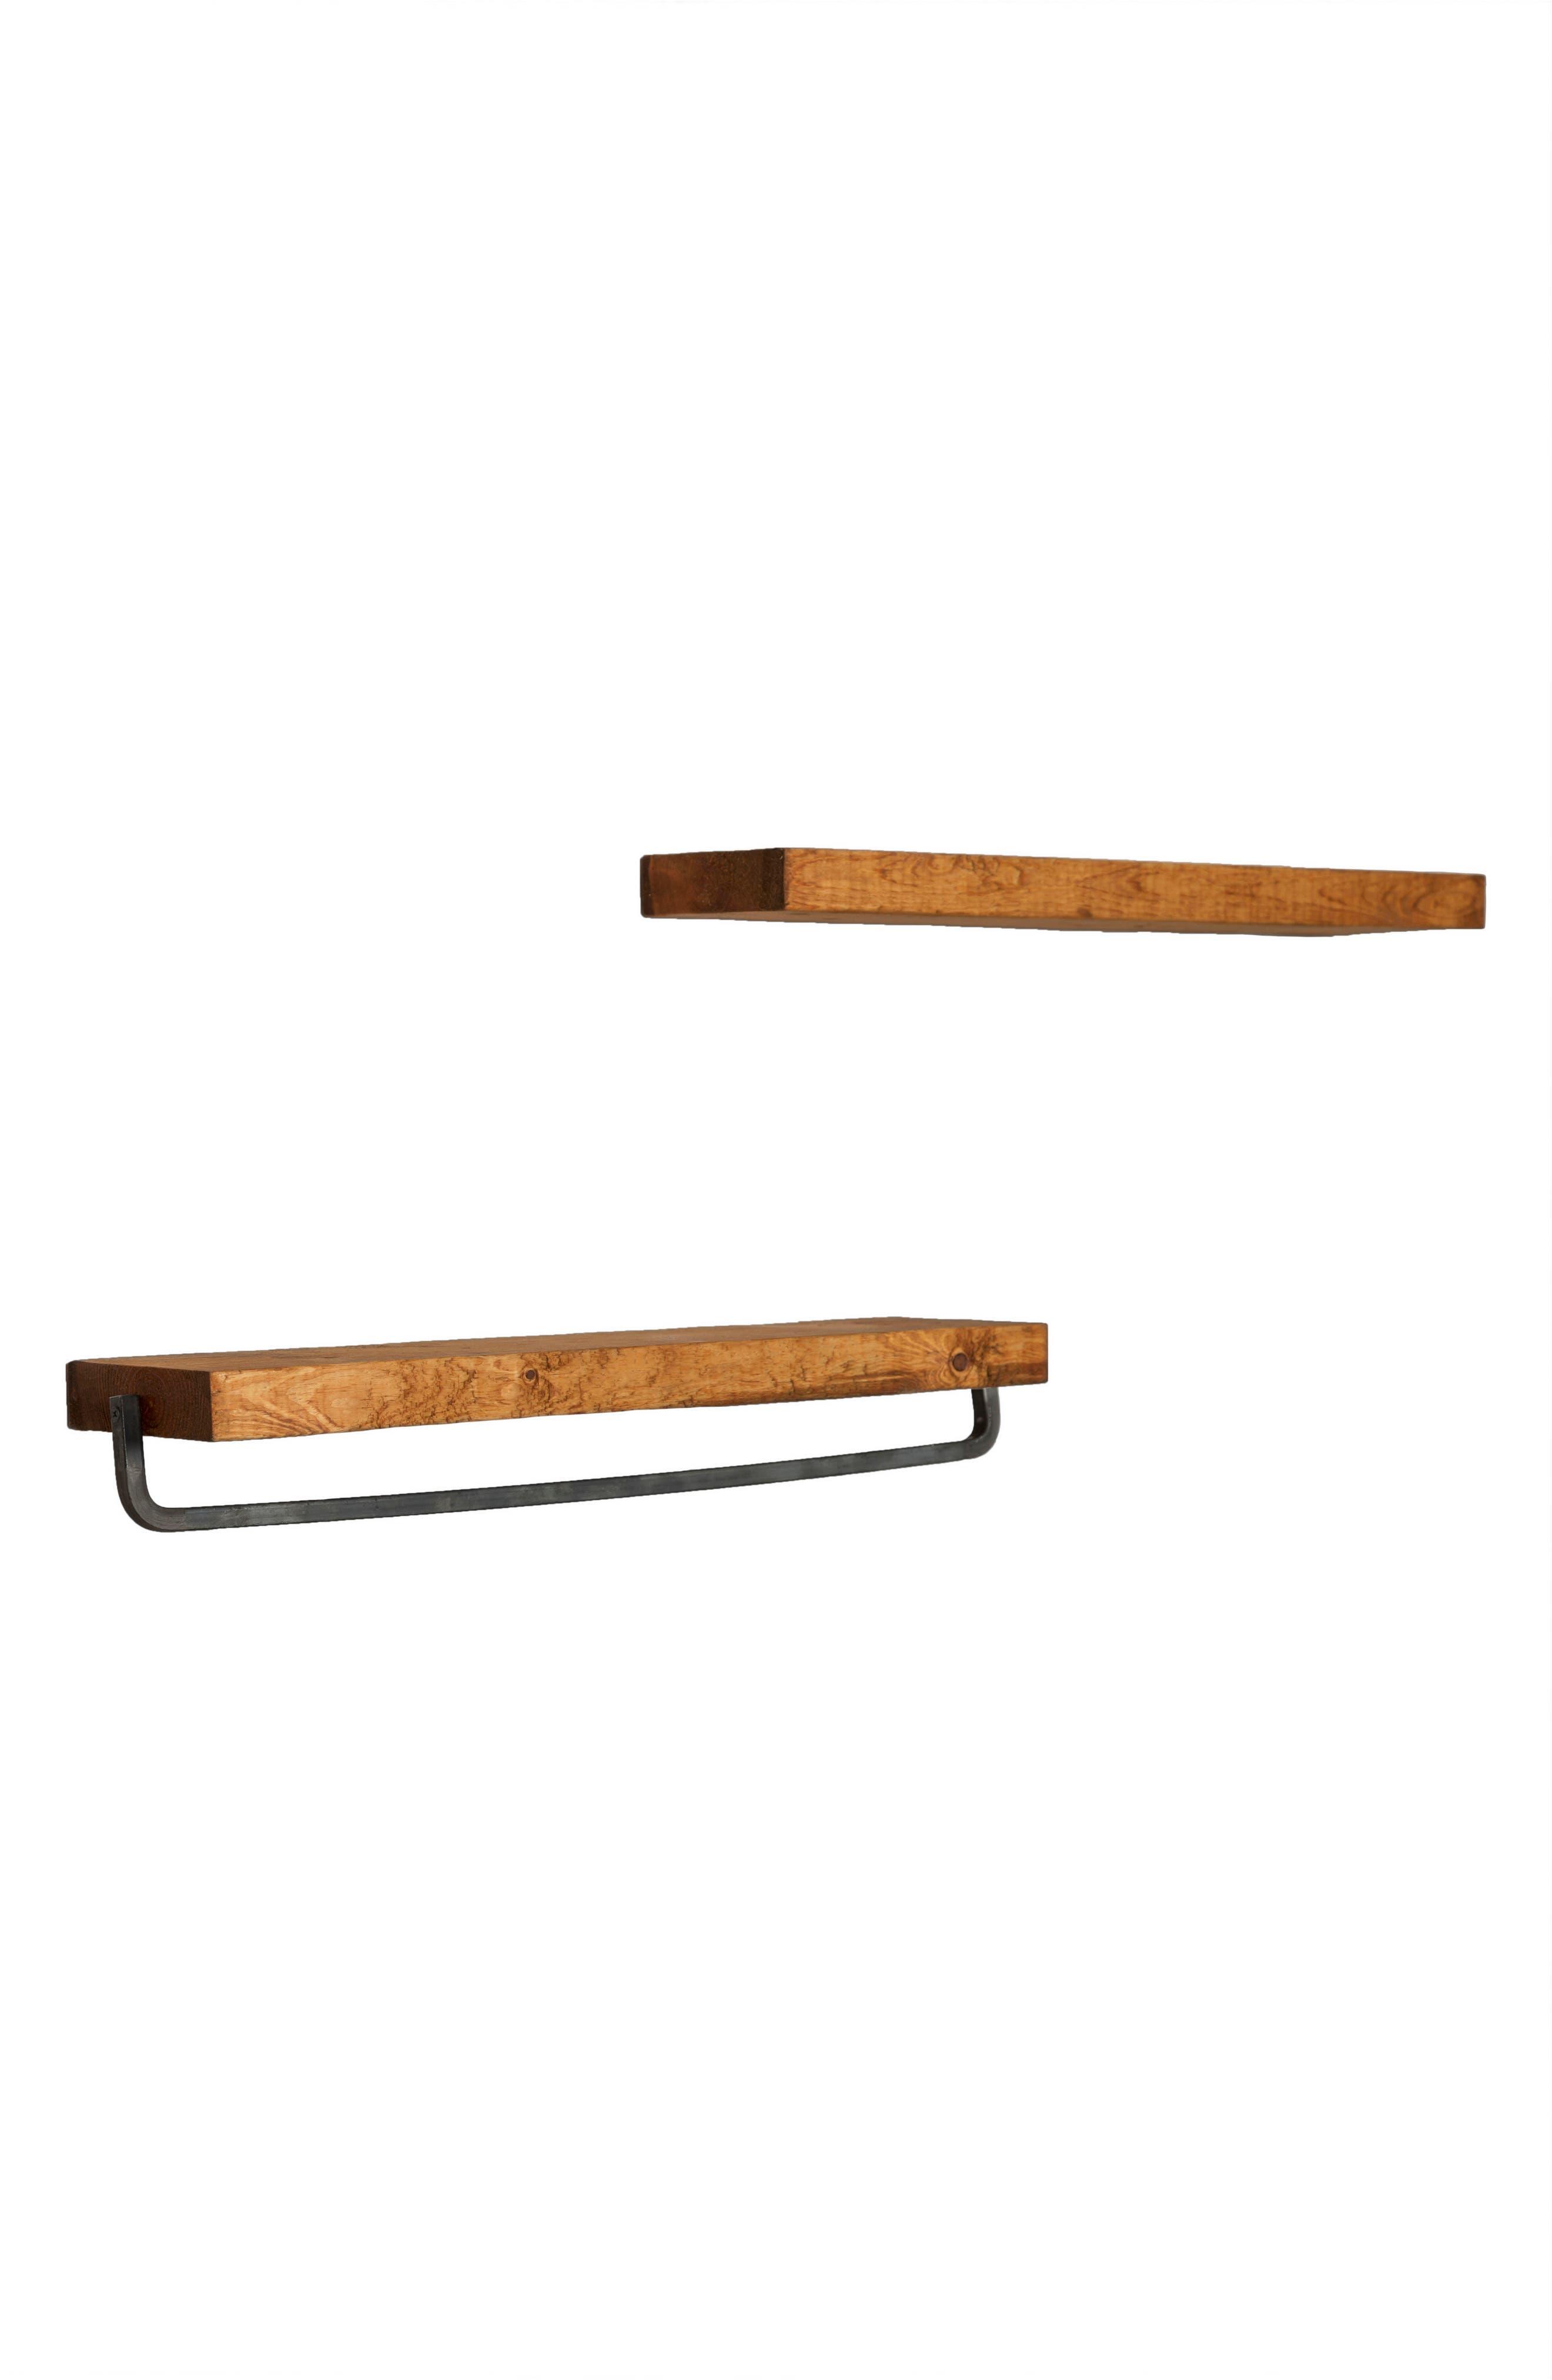 Alternate Image 1 Selected - (del)Hutson Designs Set of 2 Floating Shelves with Towel Rack